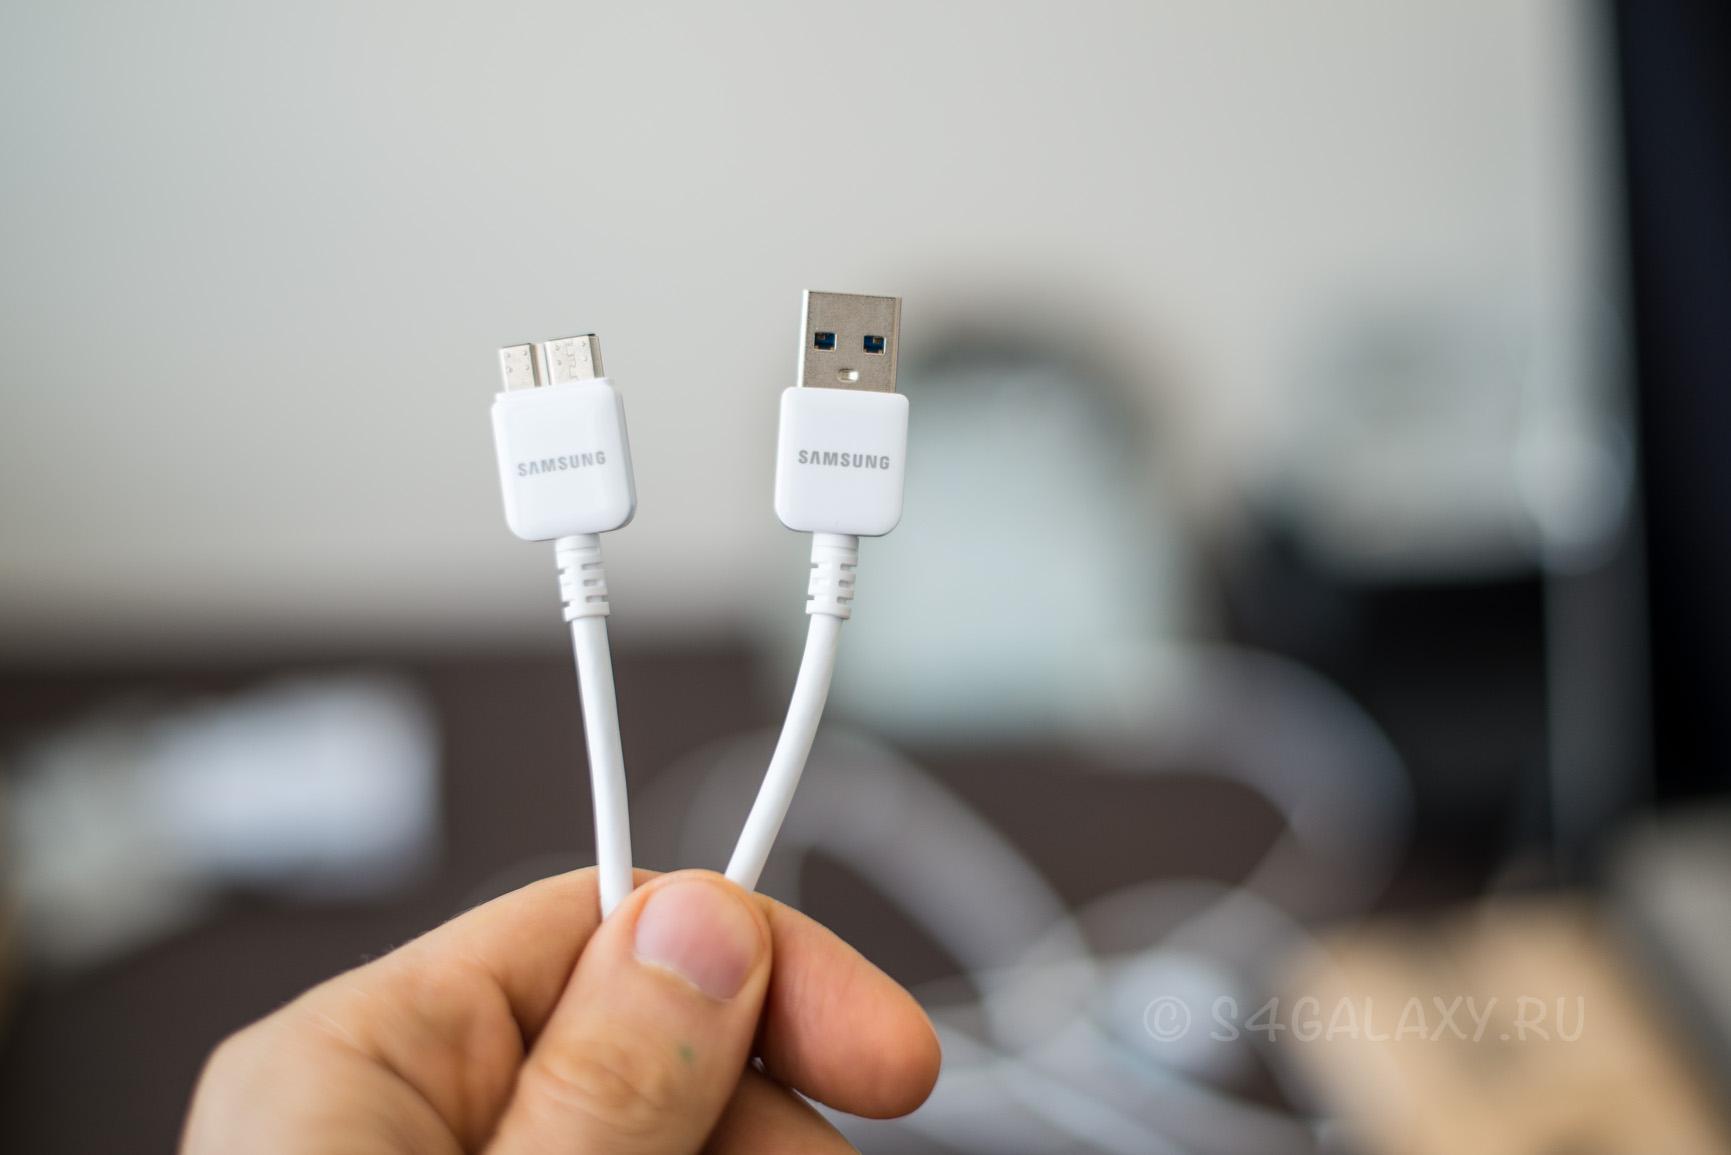 Комплект поставки Galaxy Note 3 - кабель